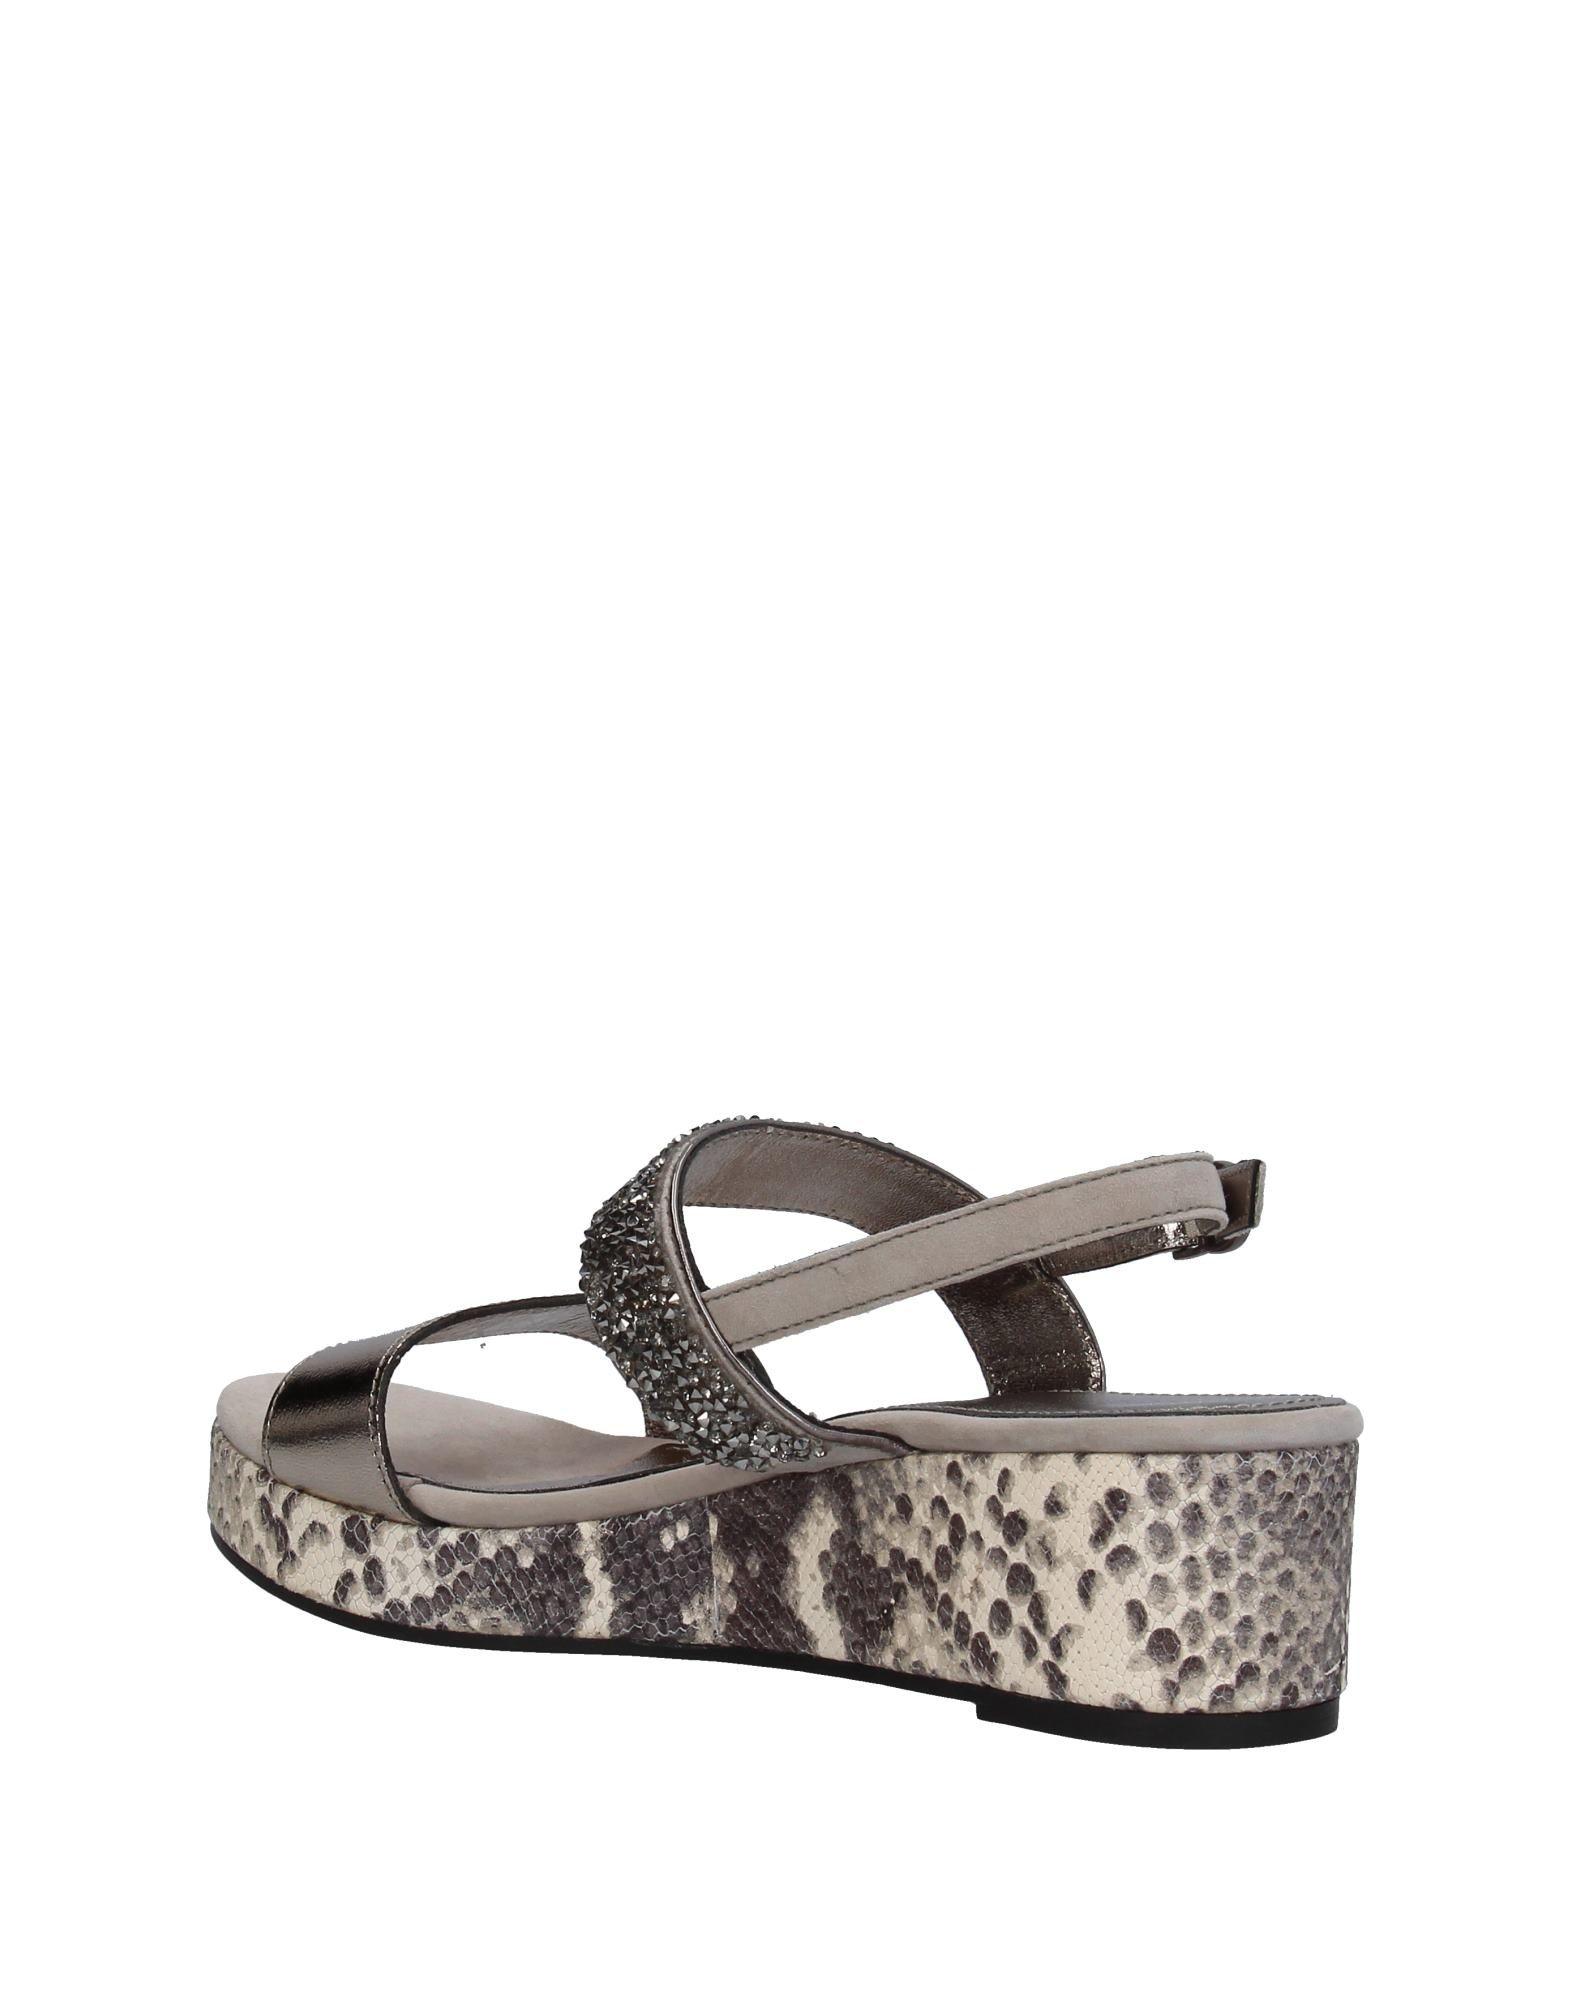 Apepazza 11393927FJ Sandalen Damen  11393927FJ Apepazza Gute Qualität beliebte Schuhe c9a458